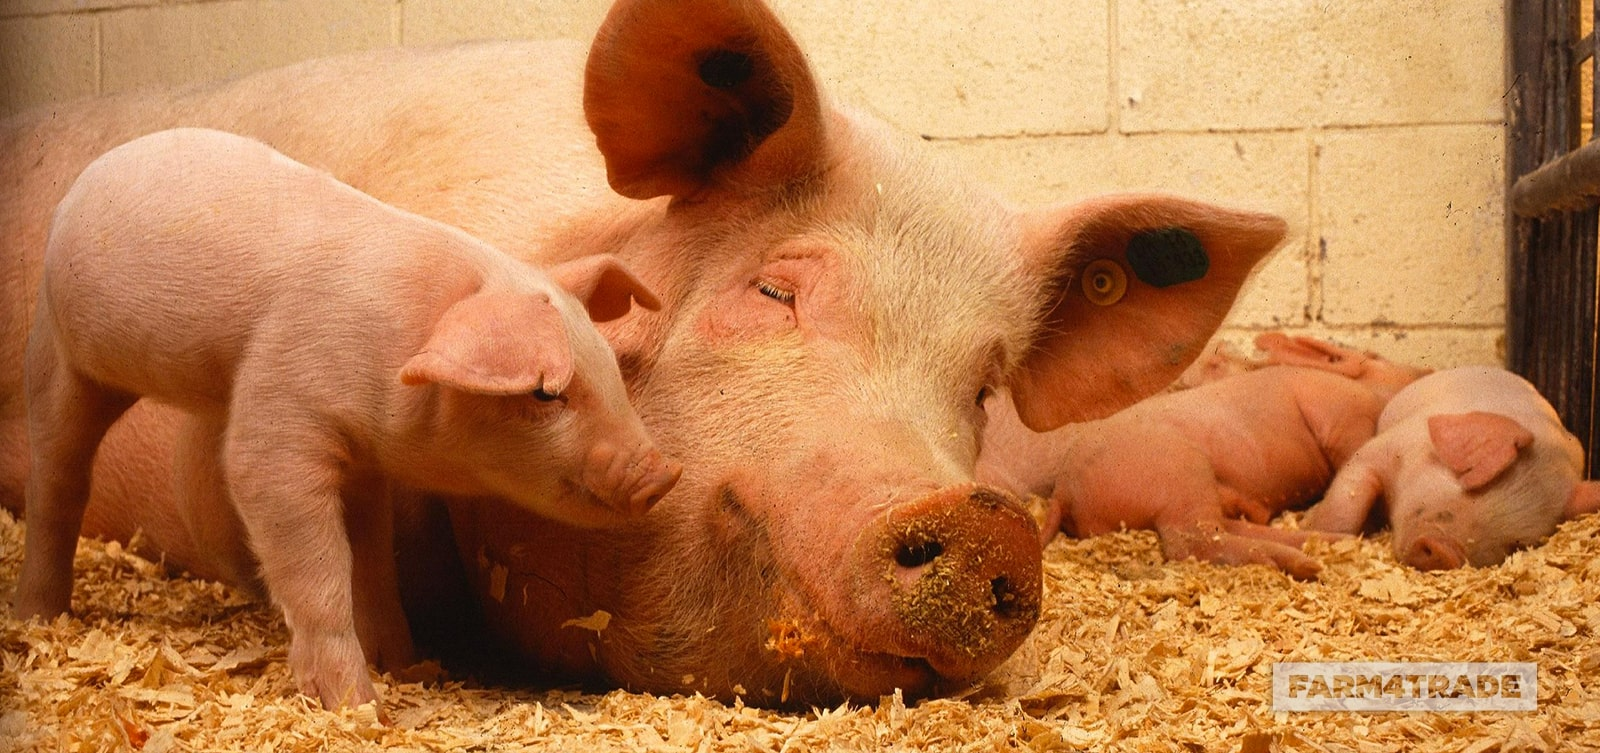 Farm4Trade-Intensive pig farming